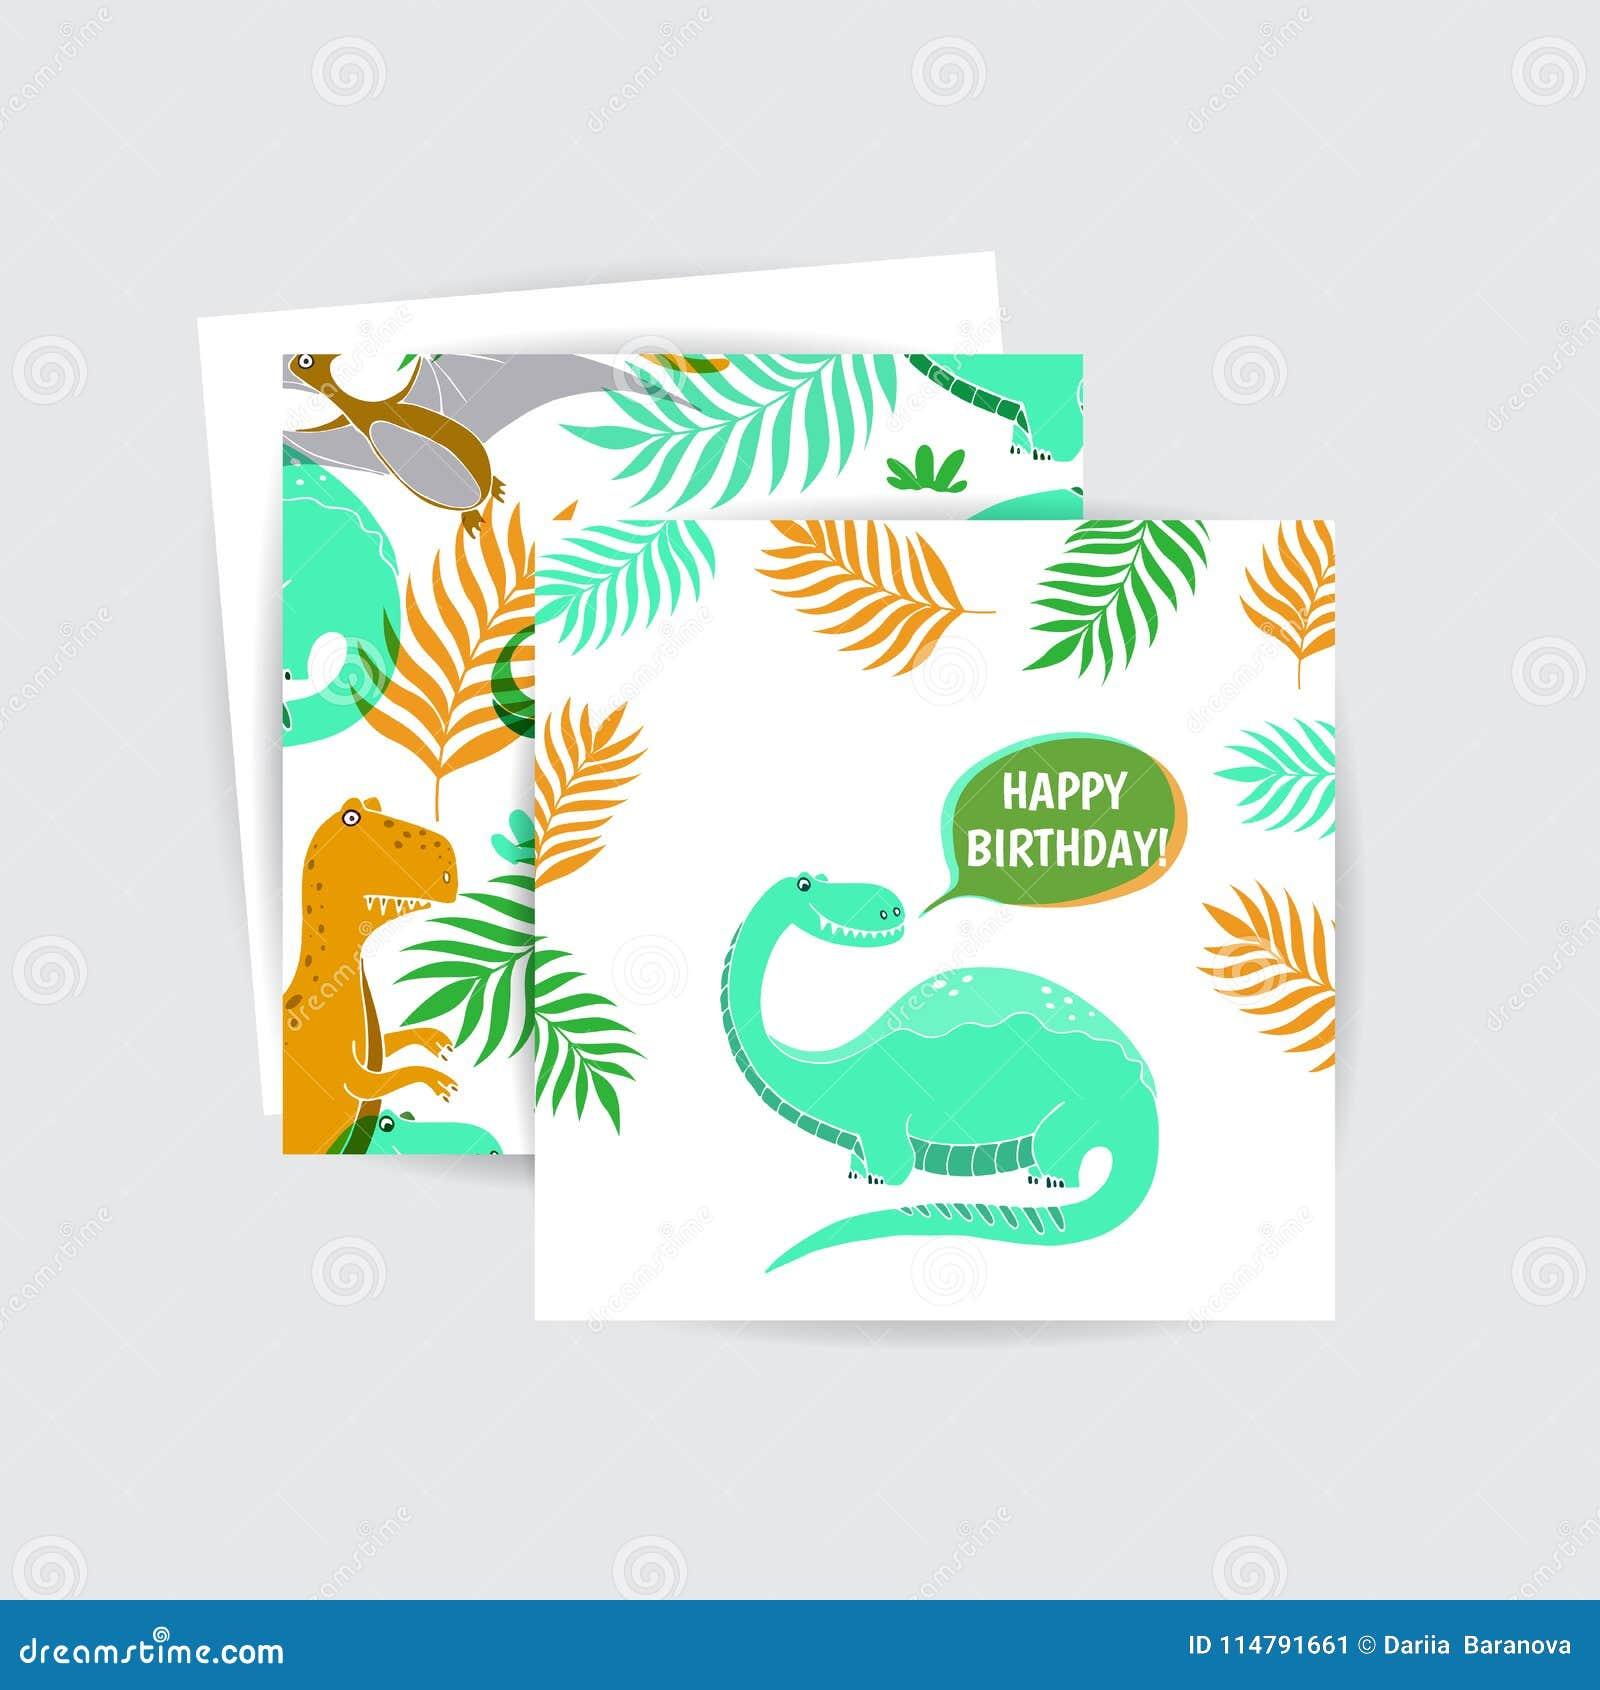 Greeting Cards With Dinosaur Stock Vector Illustration Of Kids Jpg 1300x1390 Ecard Birthday